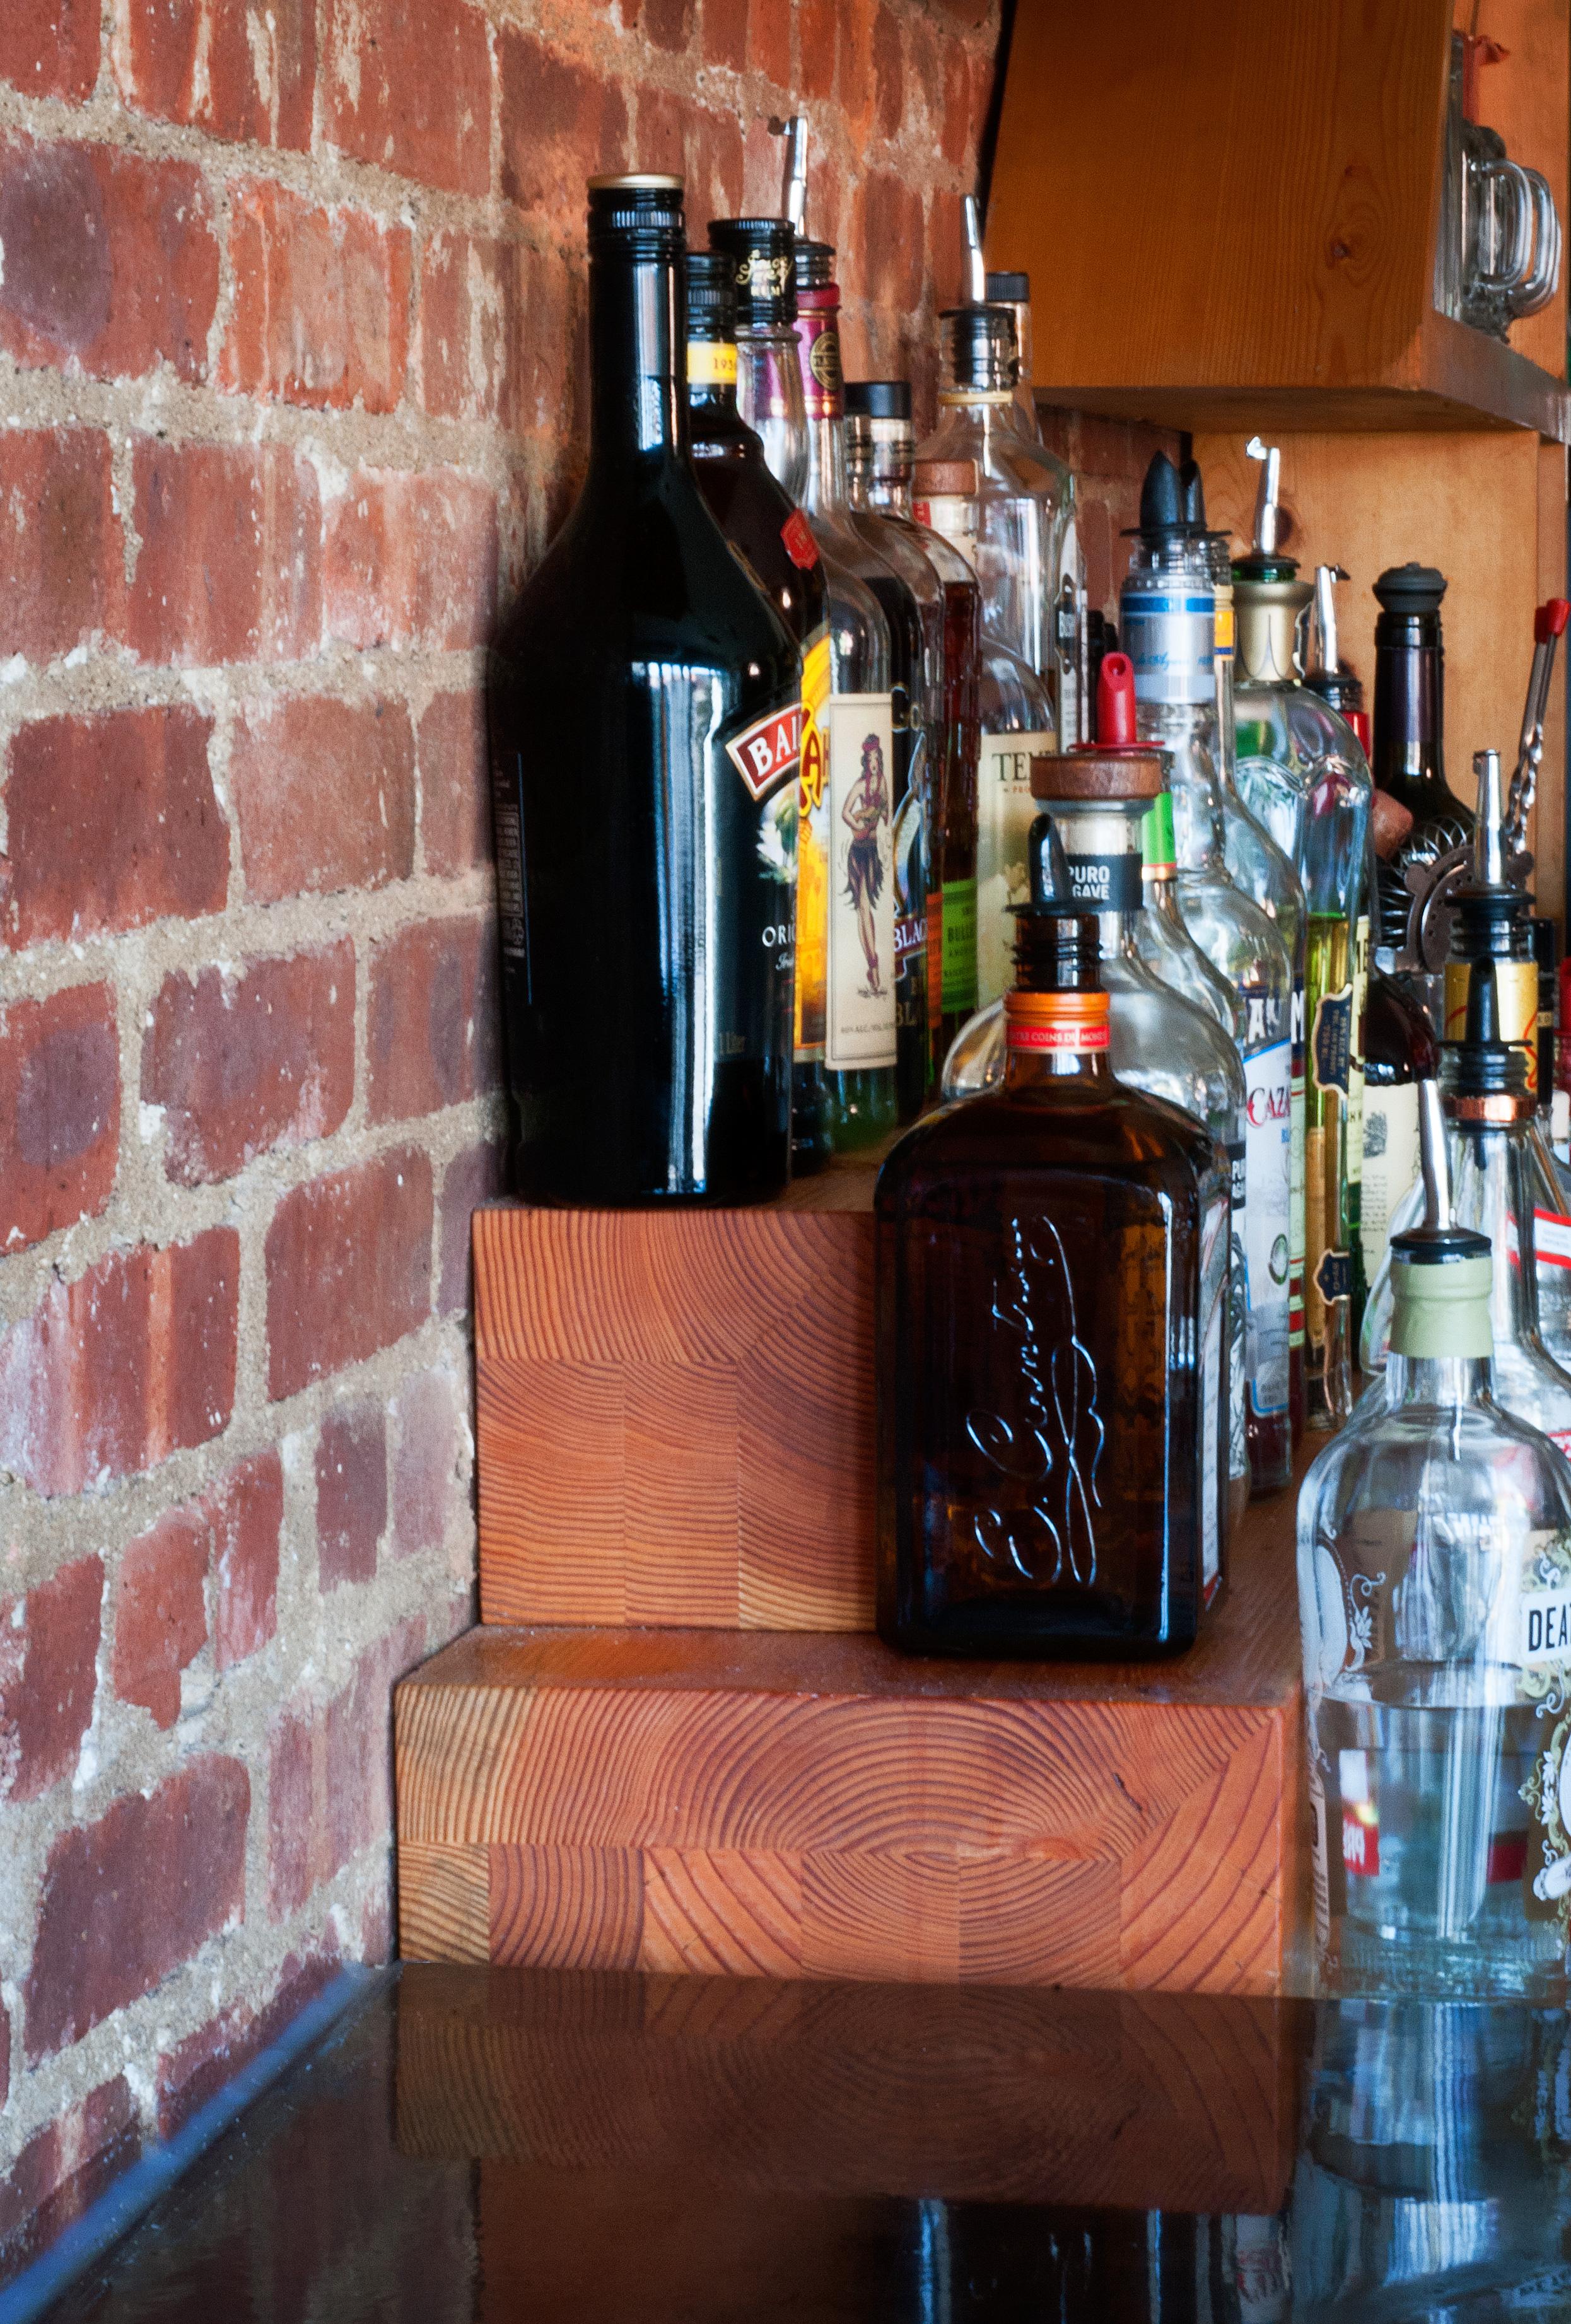 Ghia-Liquor-Step.jpg